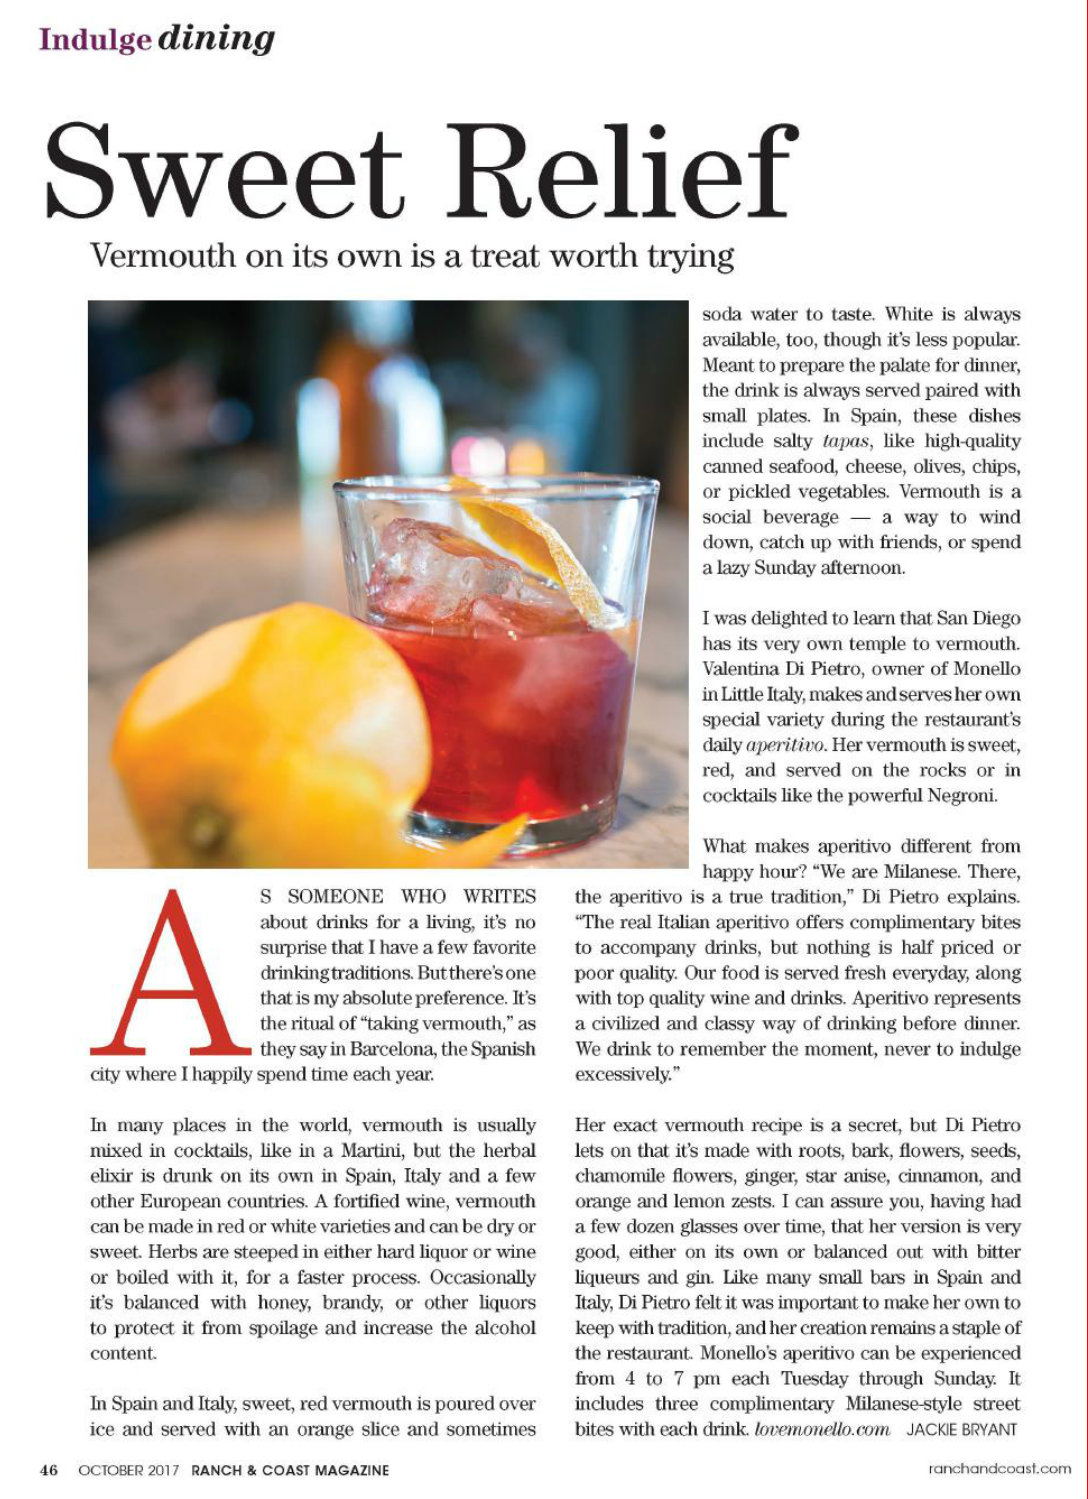 Ranch & Coast Magazine, October 2017